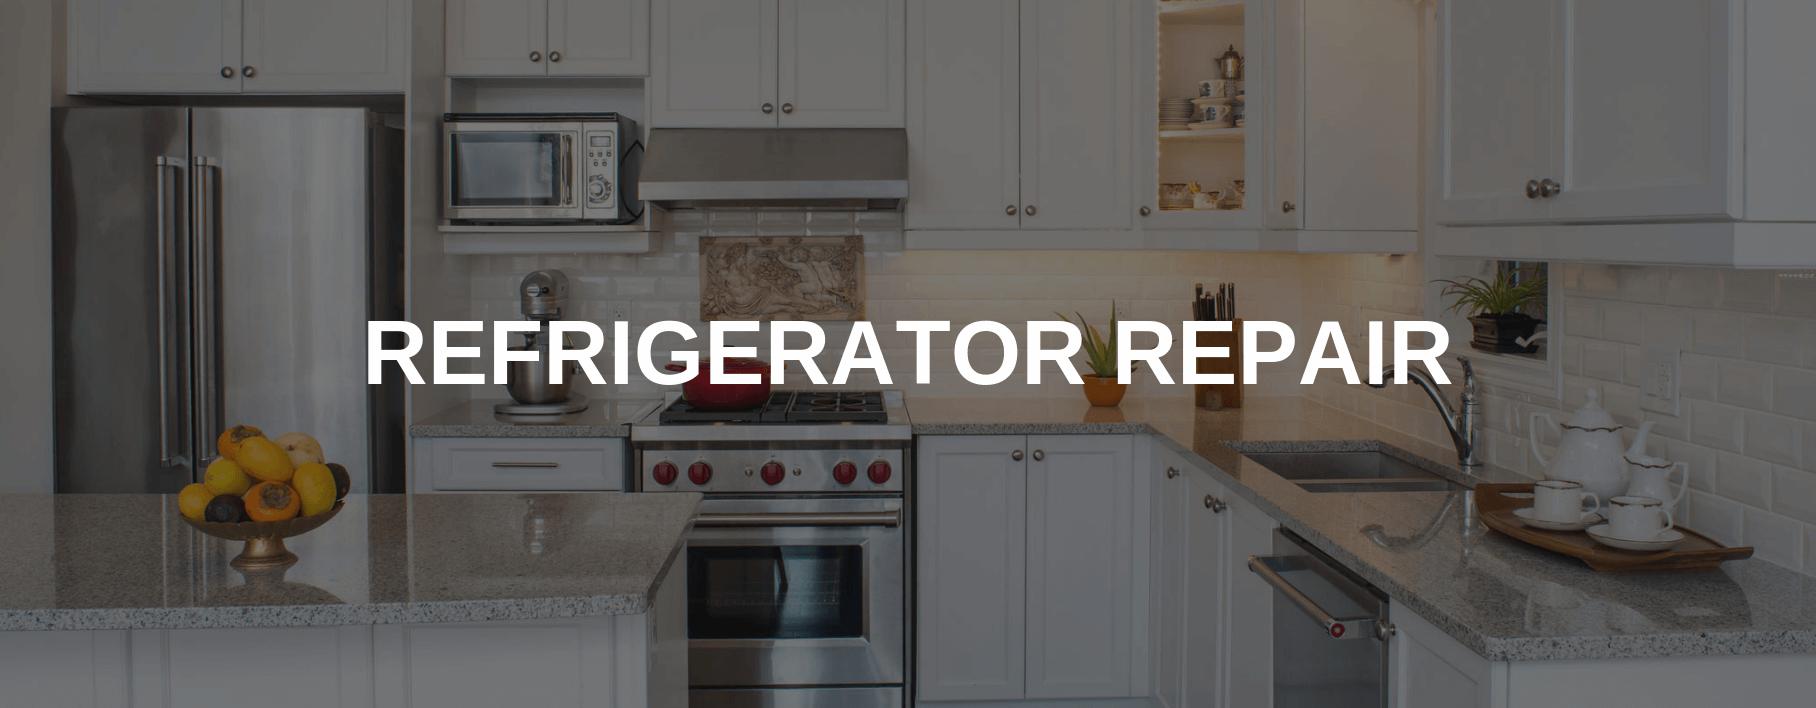 oakland refrigerator repair